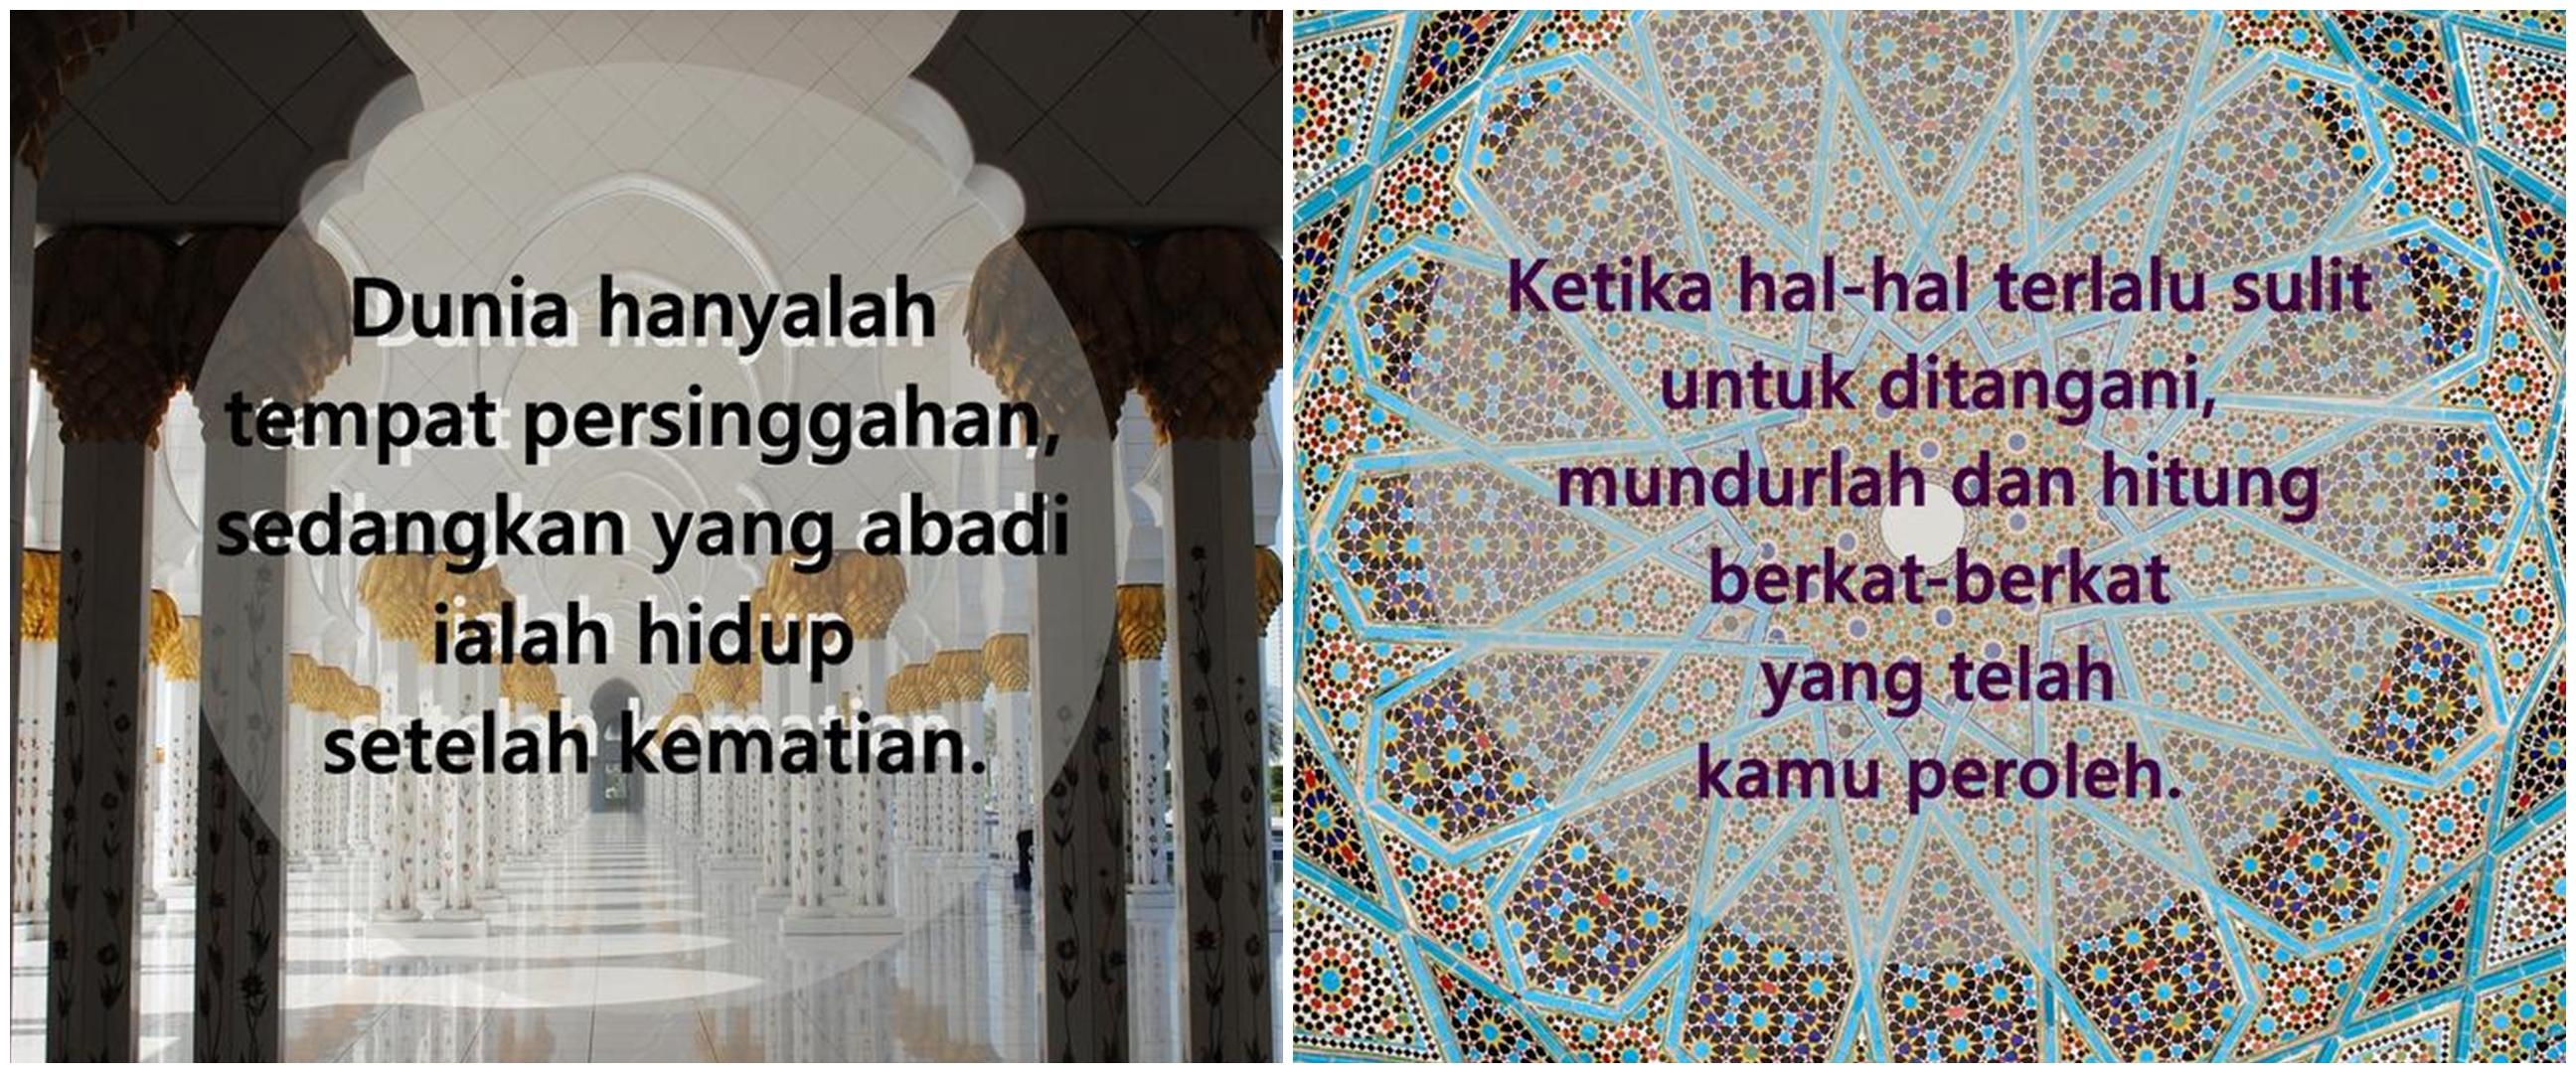 40 Kata-kata bijak islami kehidupan, inspiratif dan menyentuh hati